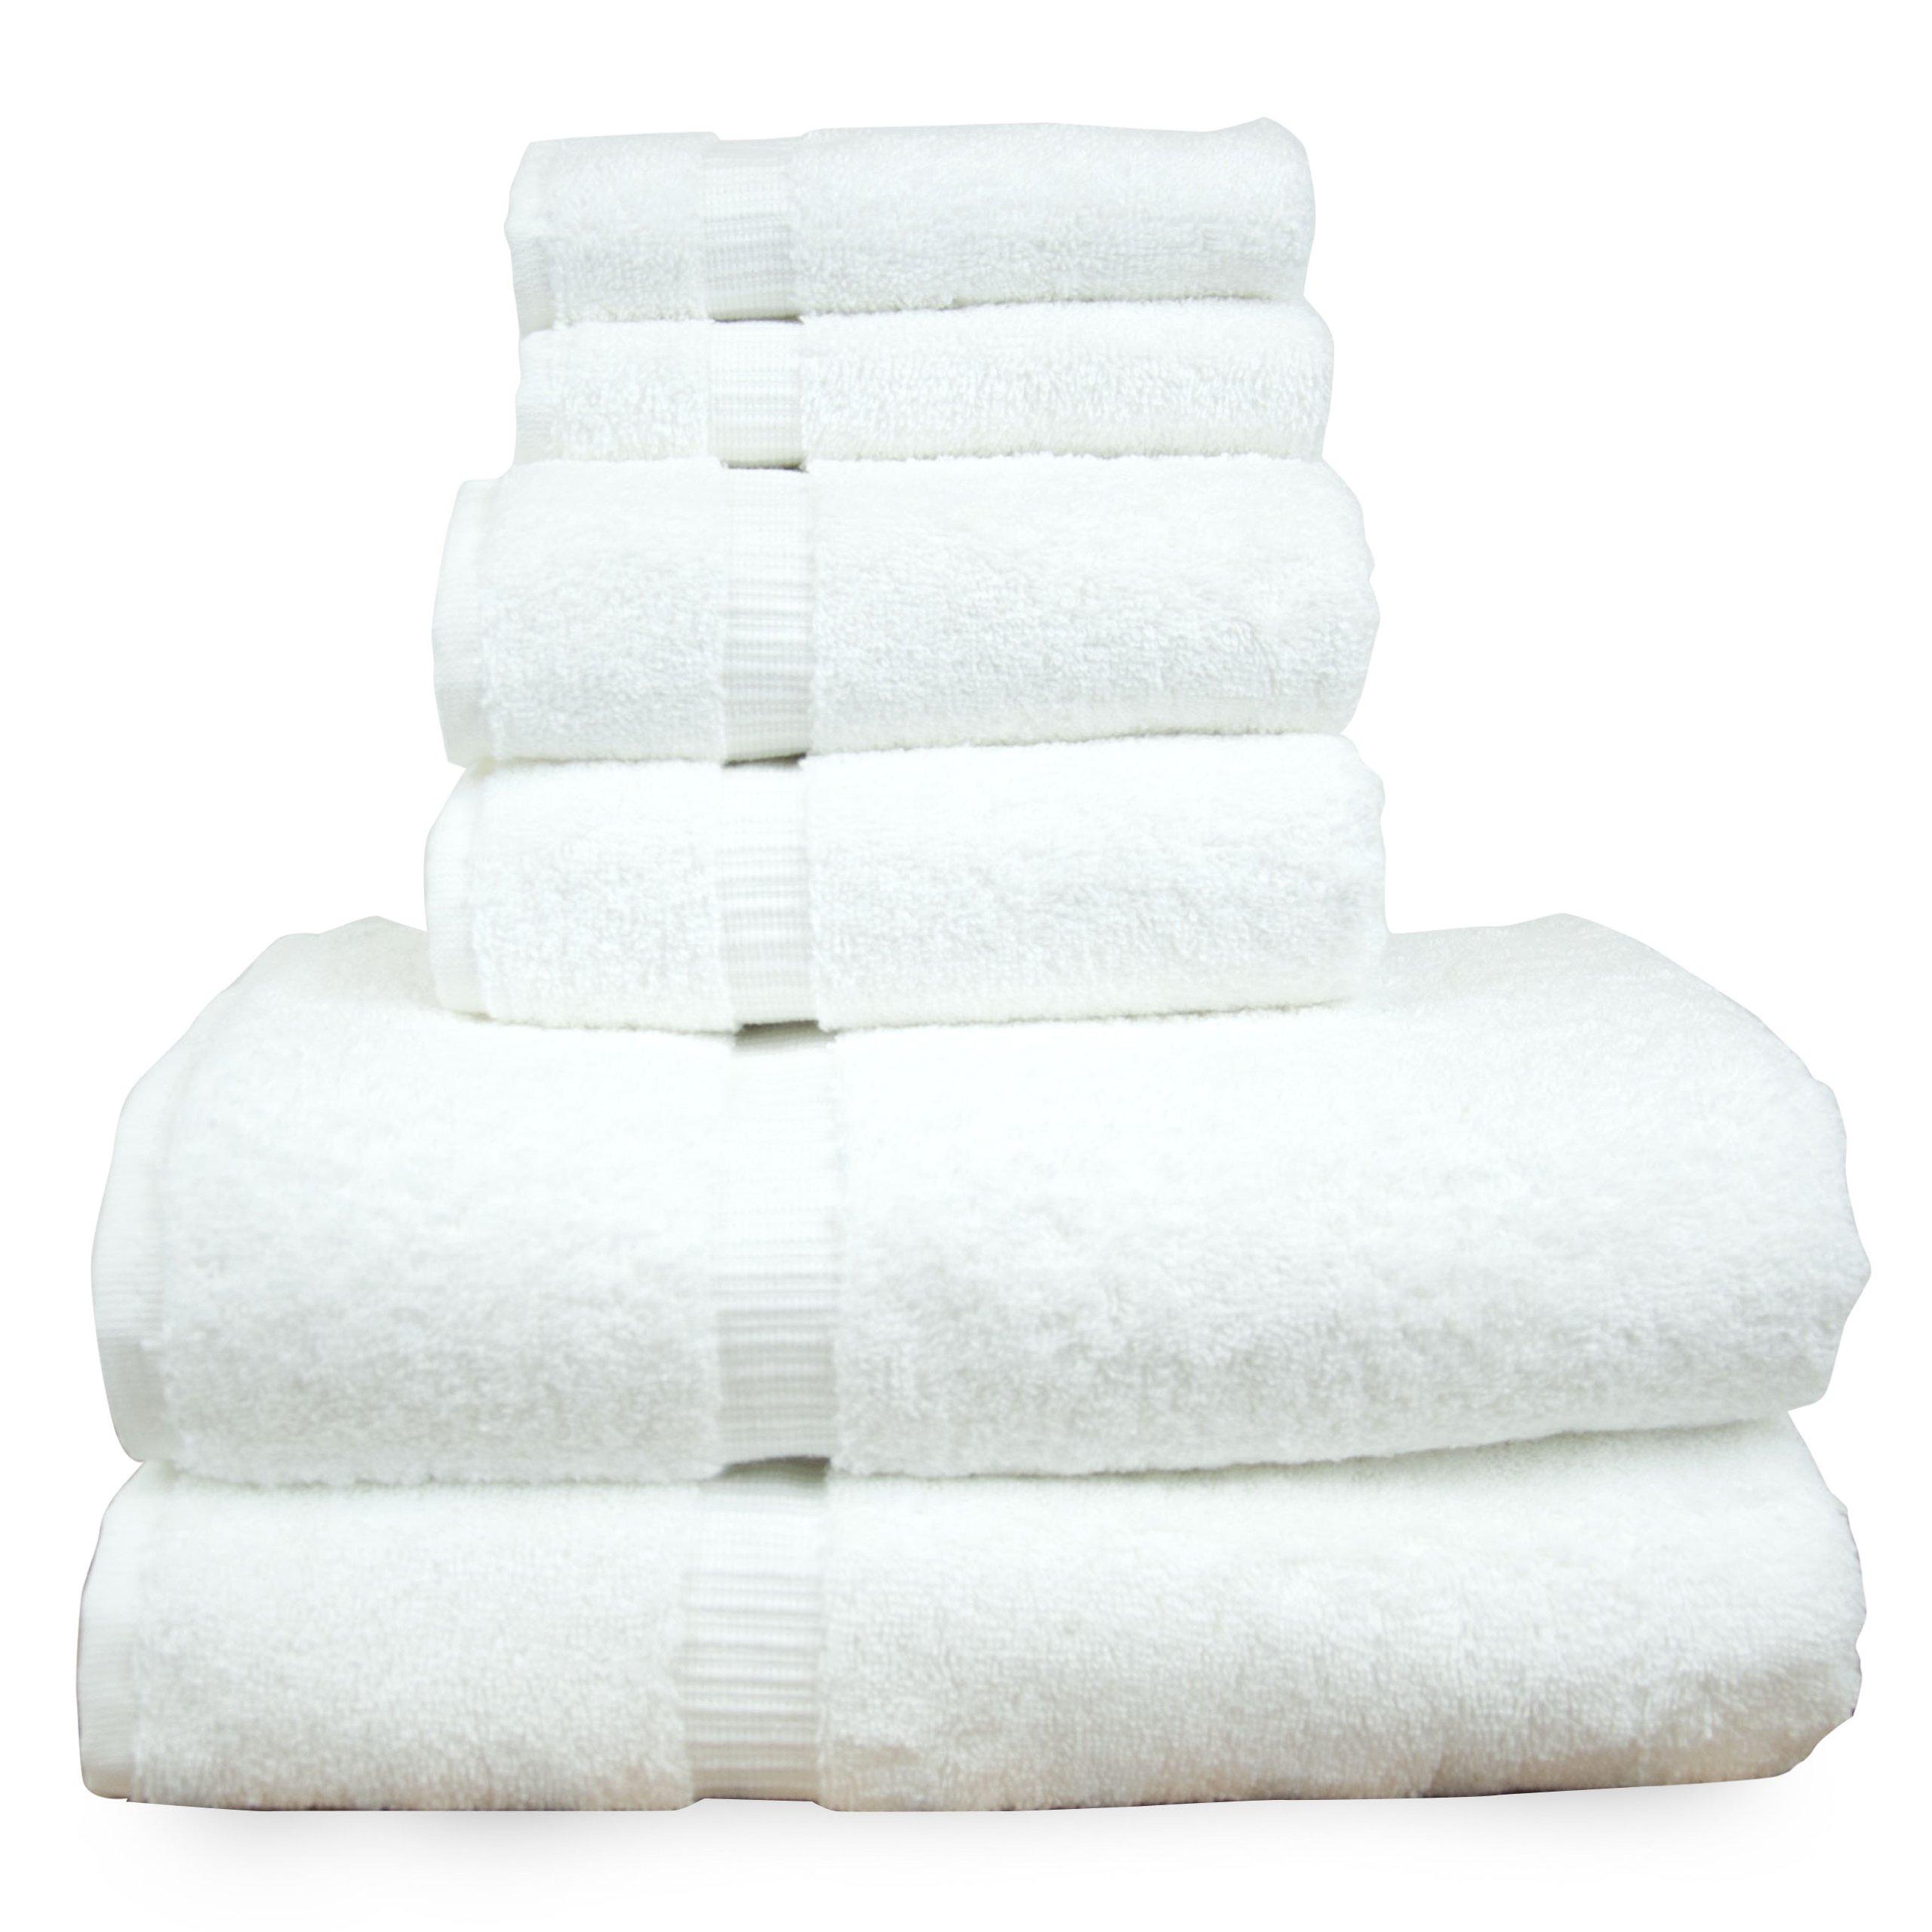 Luxury Hotel & Spa Towel Turkish Cotton Bath Towel Bundle (White, 6-Piece Towel Set)